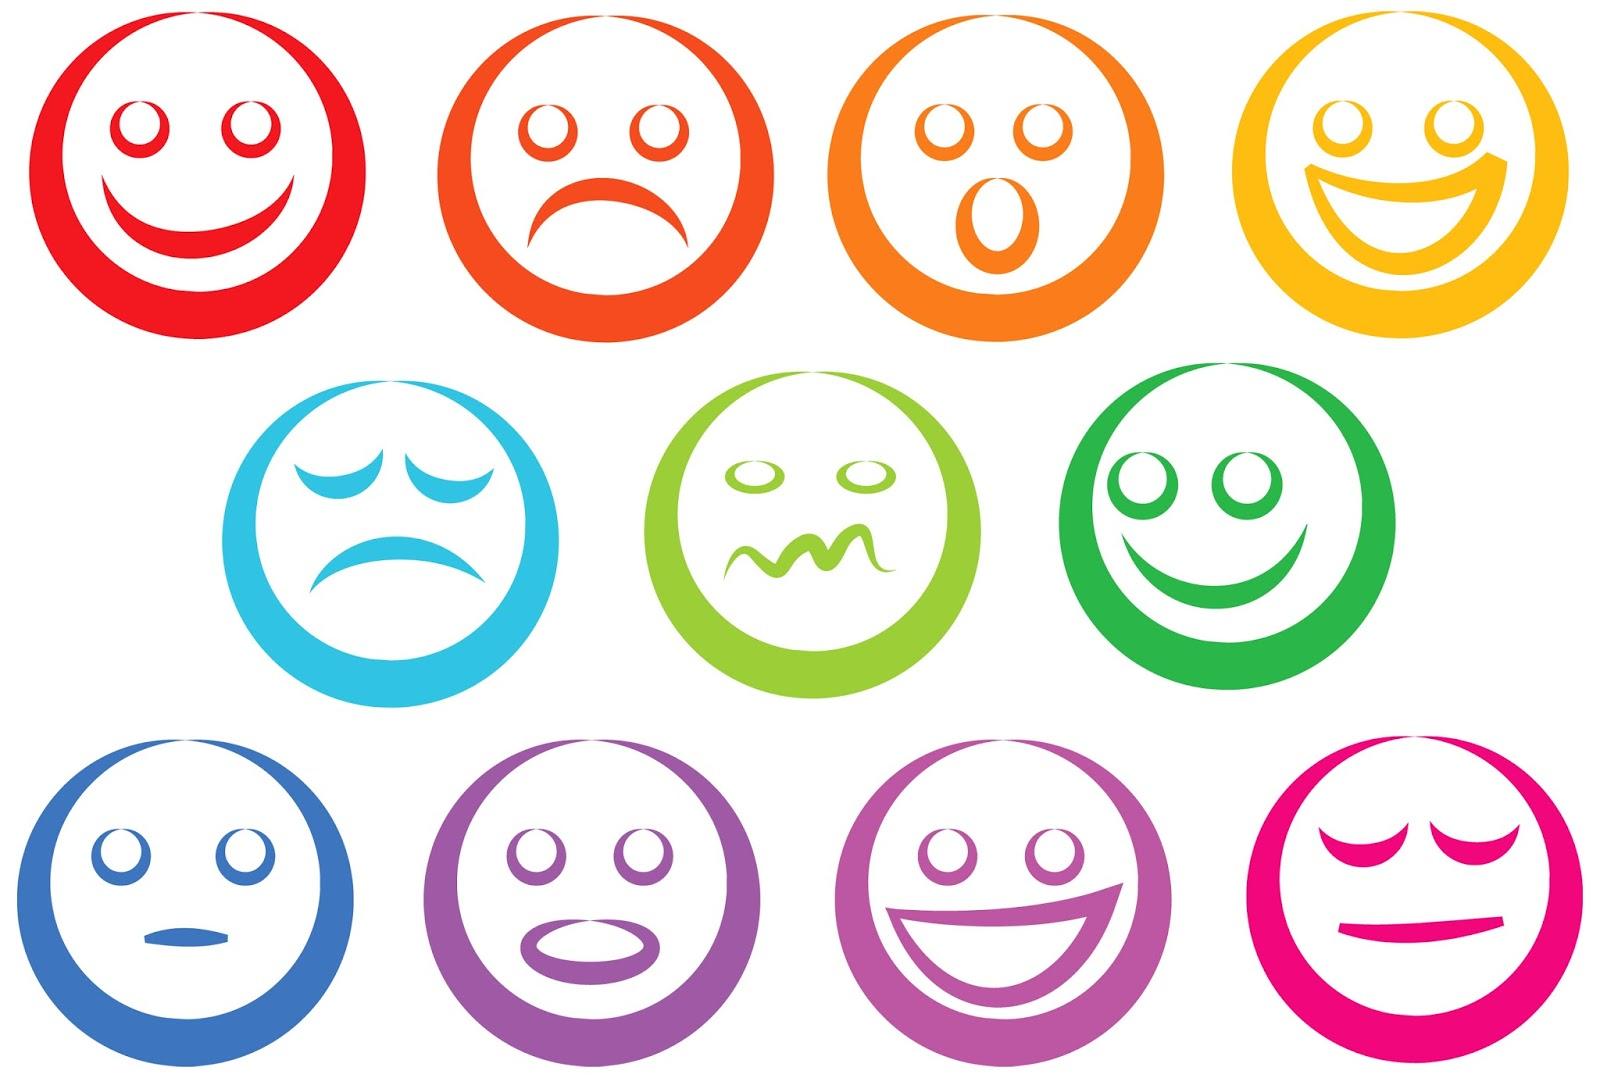 Instabilidade Emocional e a Gestalt Terapia